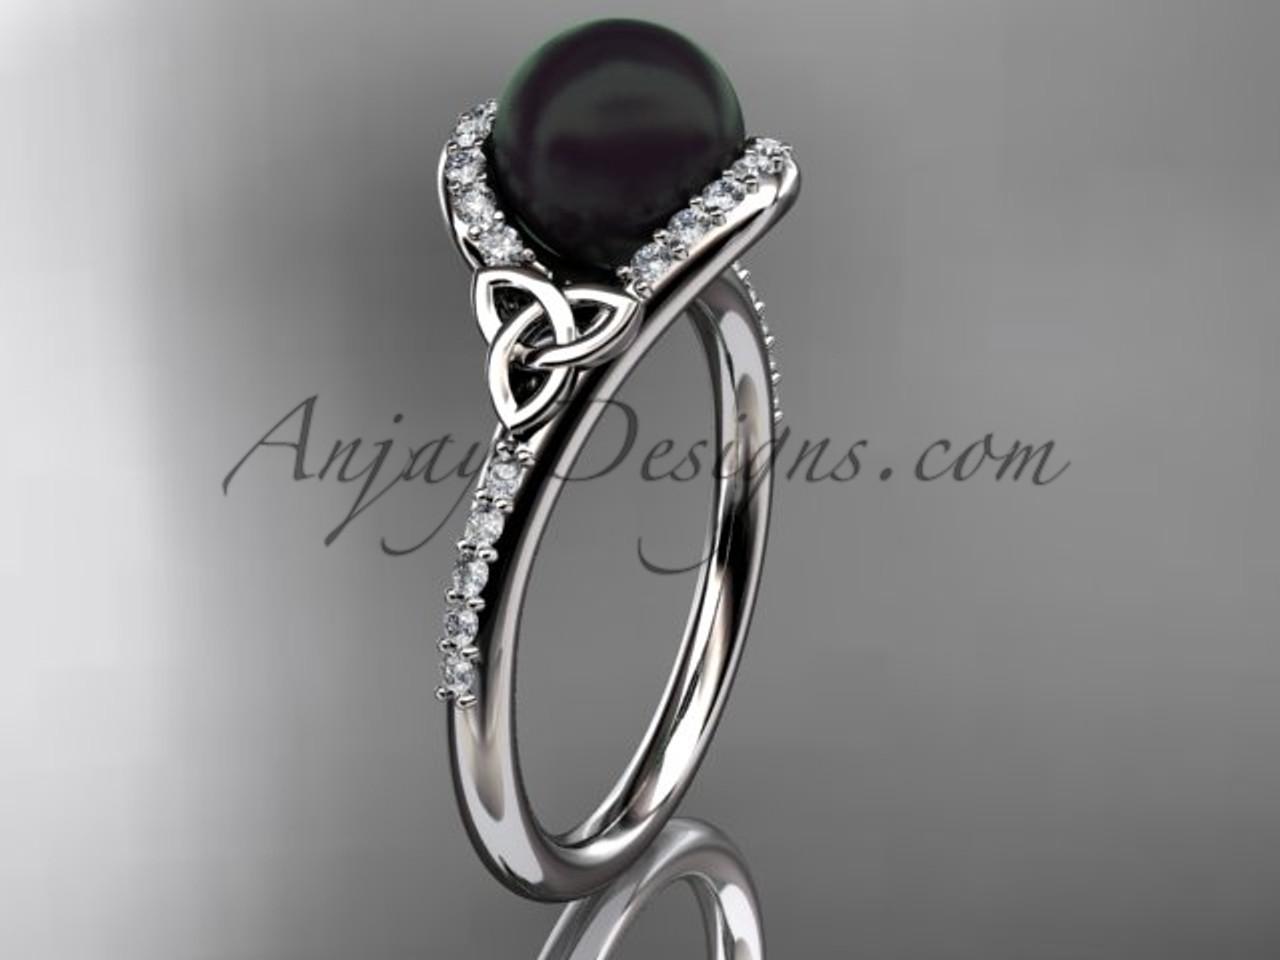 Pearl Wedding Rings.Irish Black Cultured Pearl Engagement Rings Platinum Diamond Celtic Trinity Knot Wedding Ring Ctbp7317